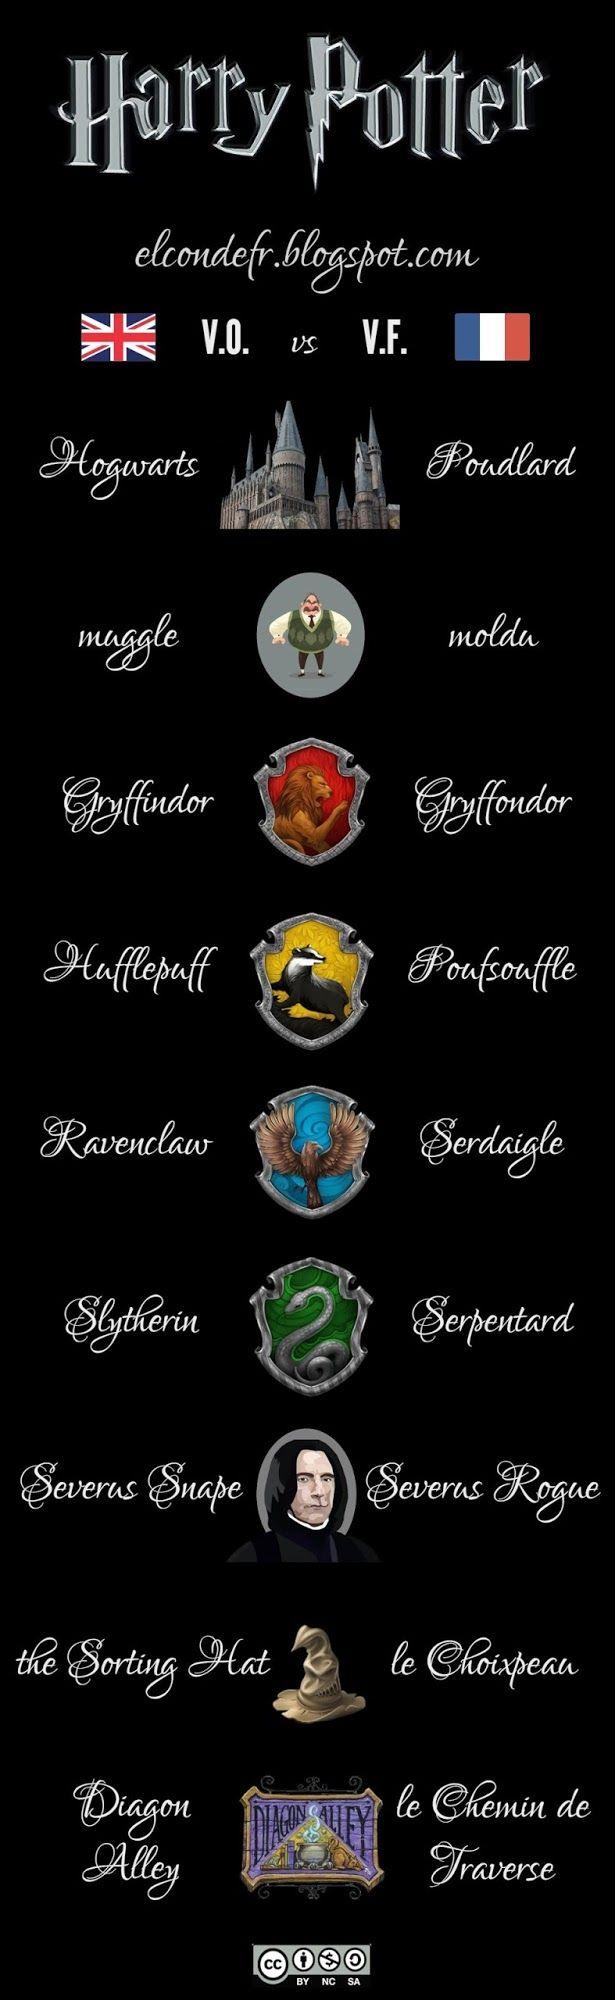 El Conde. fr: Harry Potter en version française